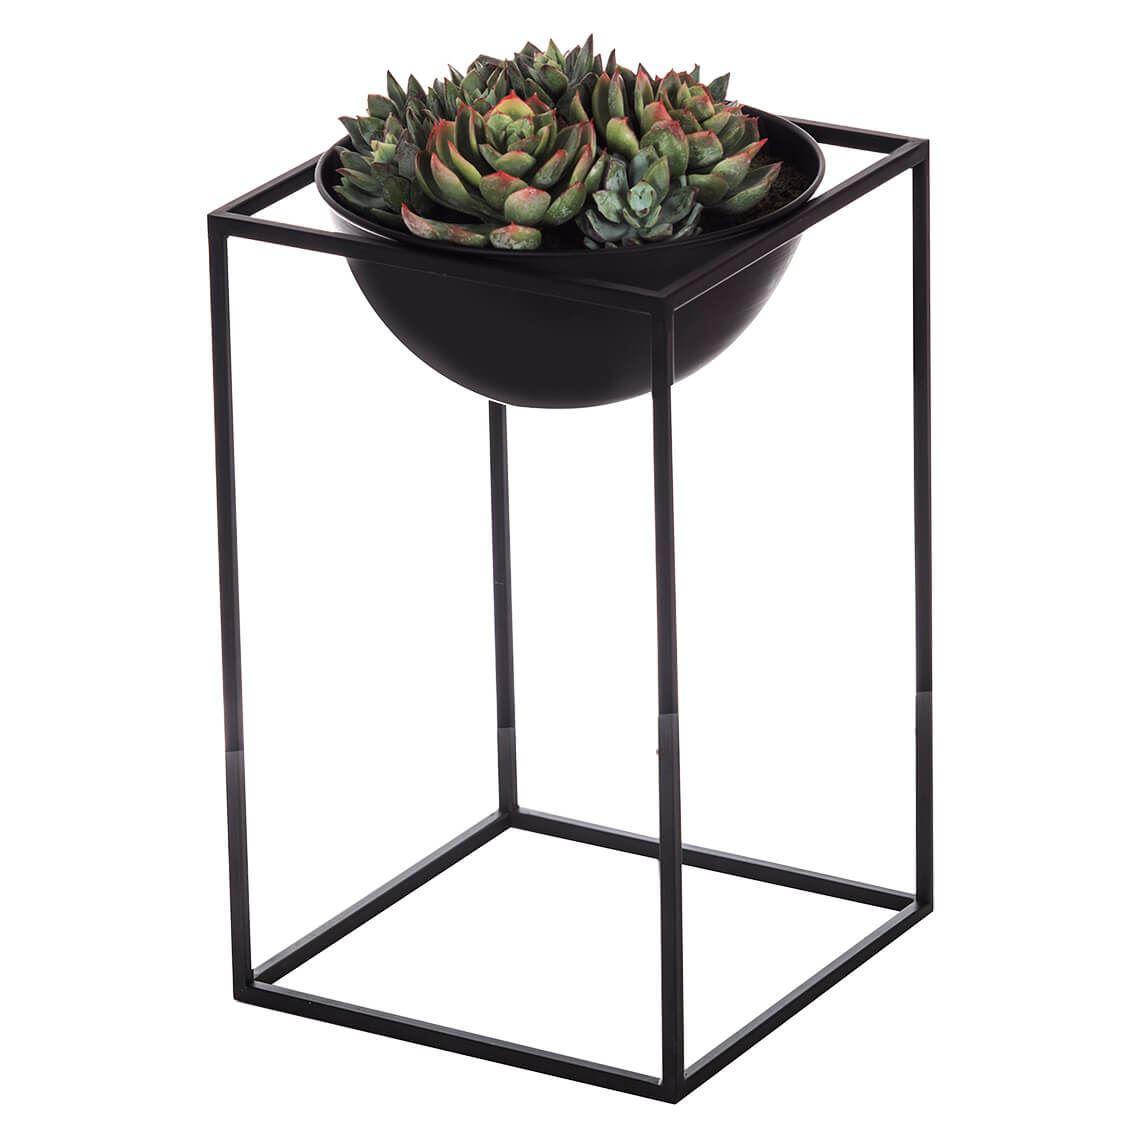 Lotus Echeveria Mix Rectangle Planter Size W 20cm x D 20cm x H 35cm in Black Freedom